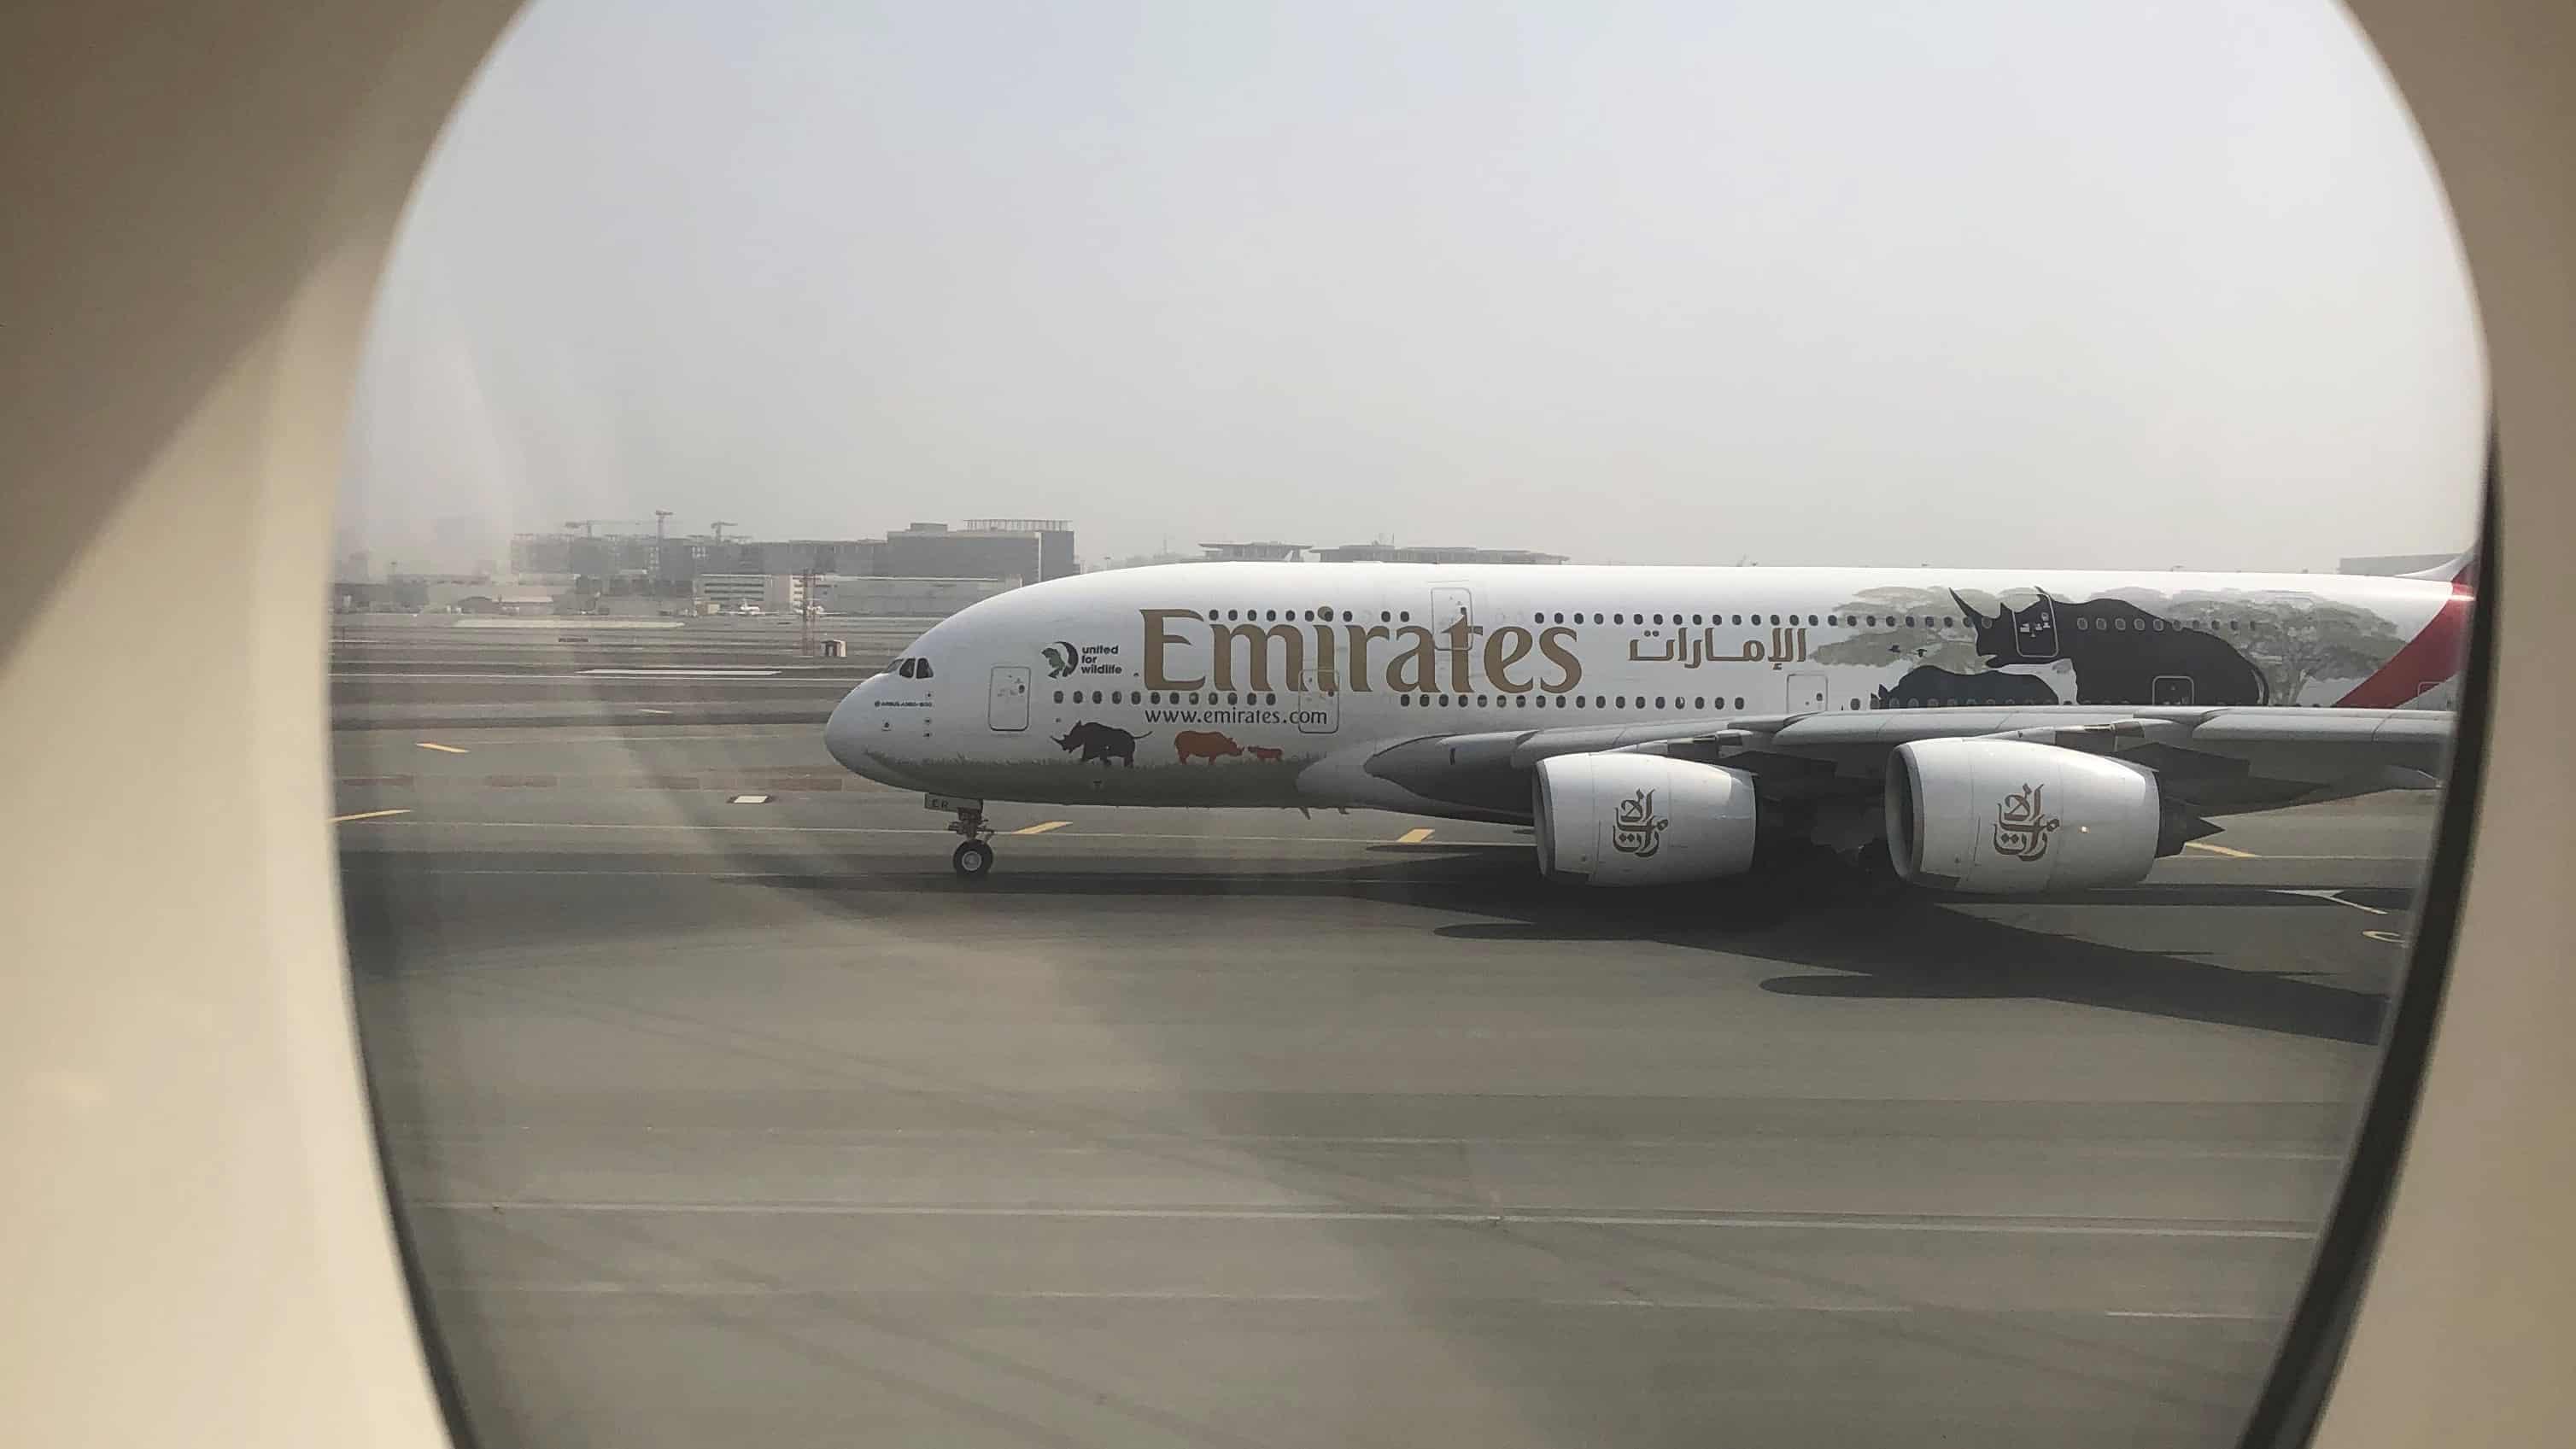 Emirates A380 at Dubai Airport